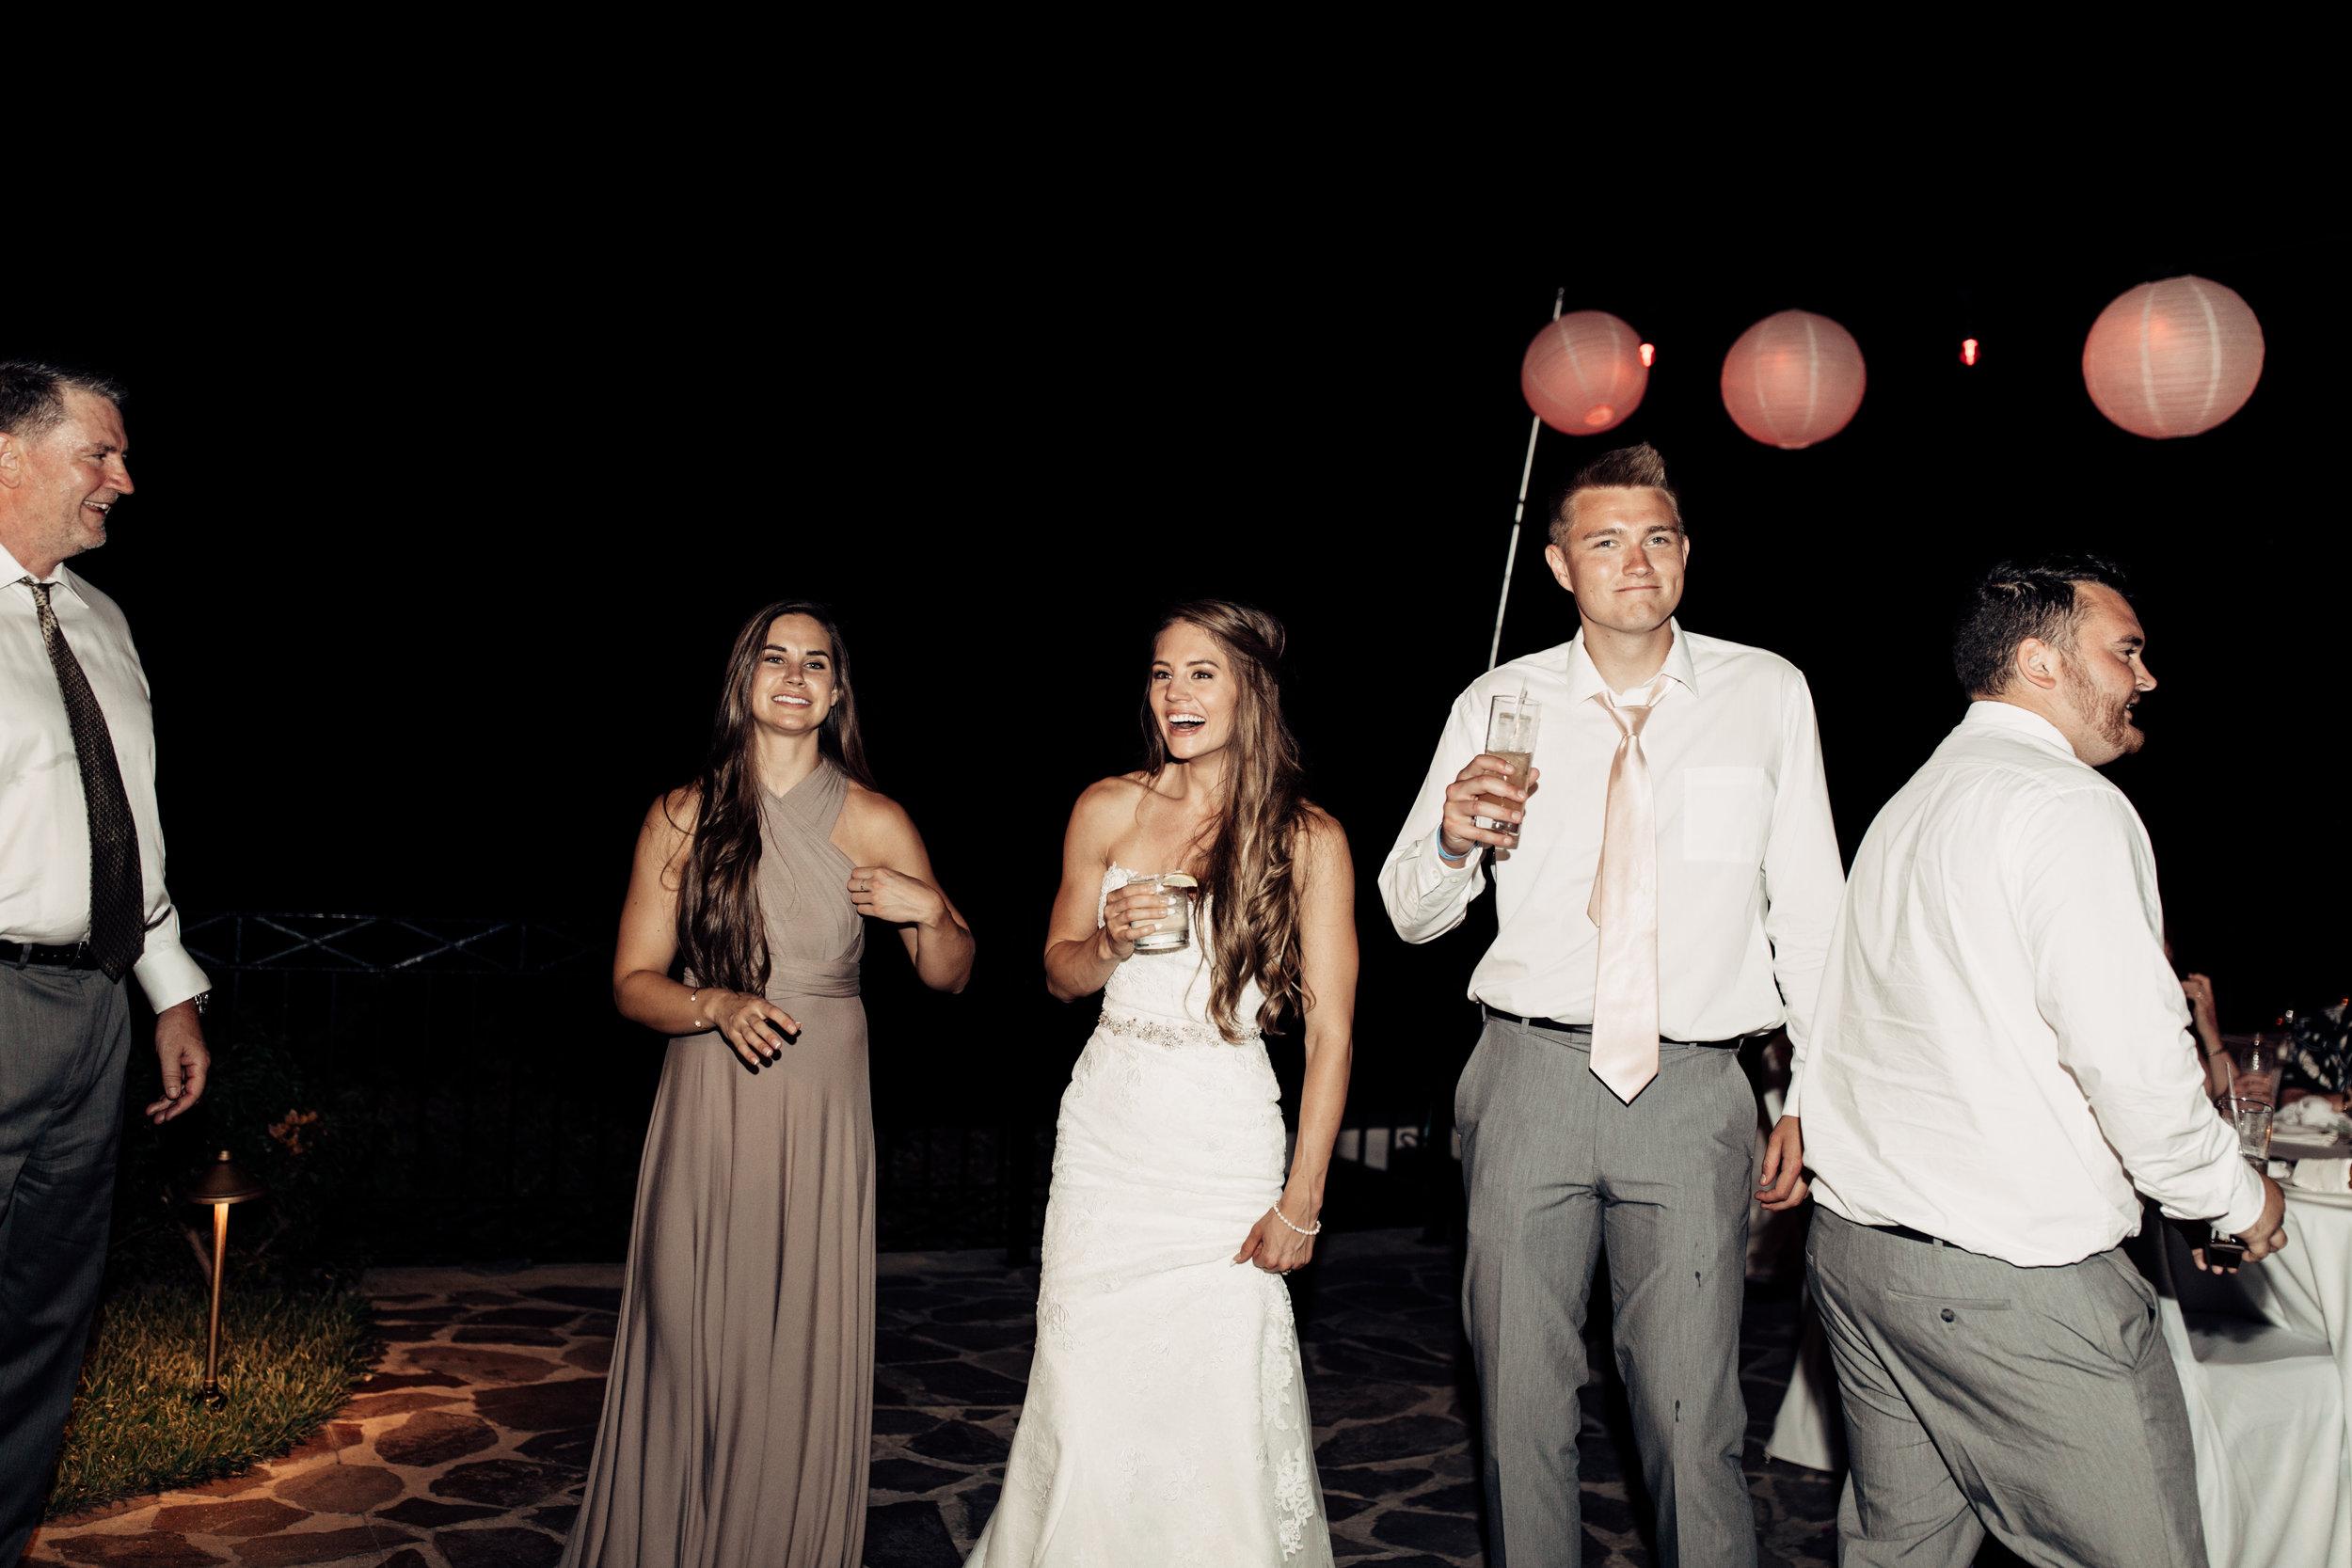 pueblo-bonito-sunset-beach-wedding-cabo-san-lucas837.jpg